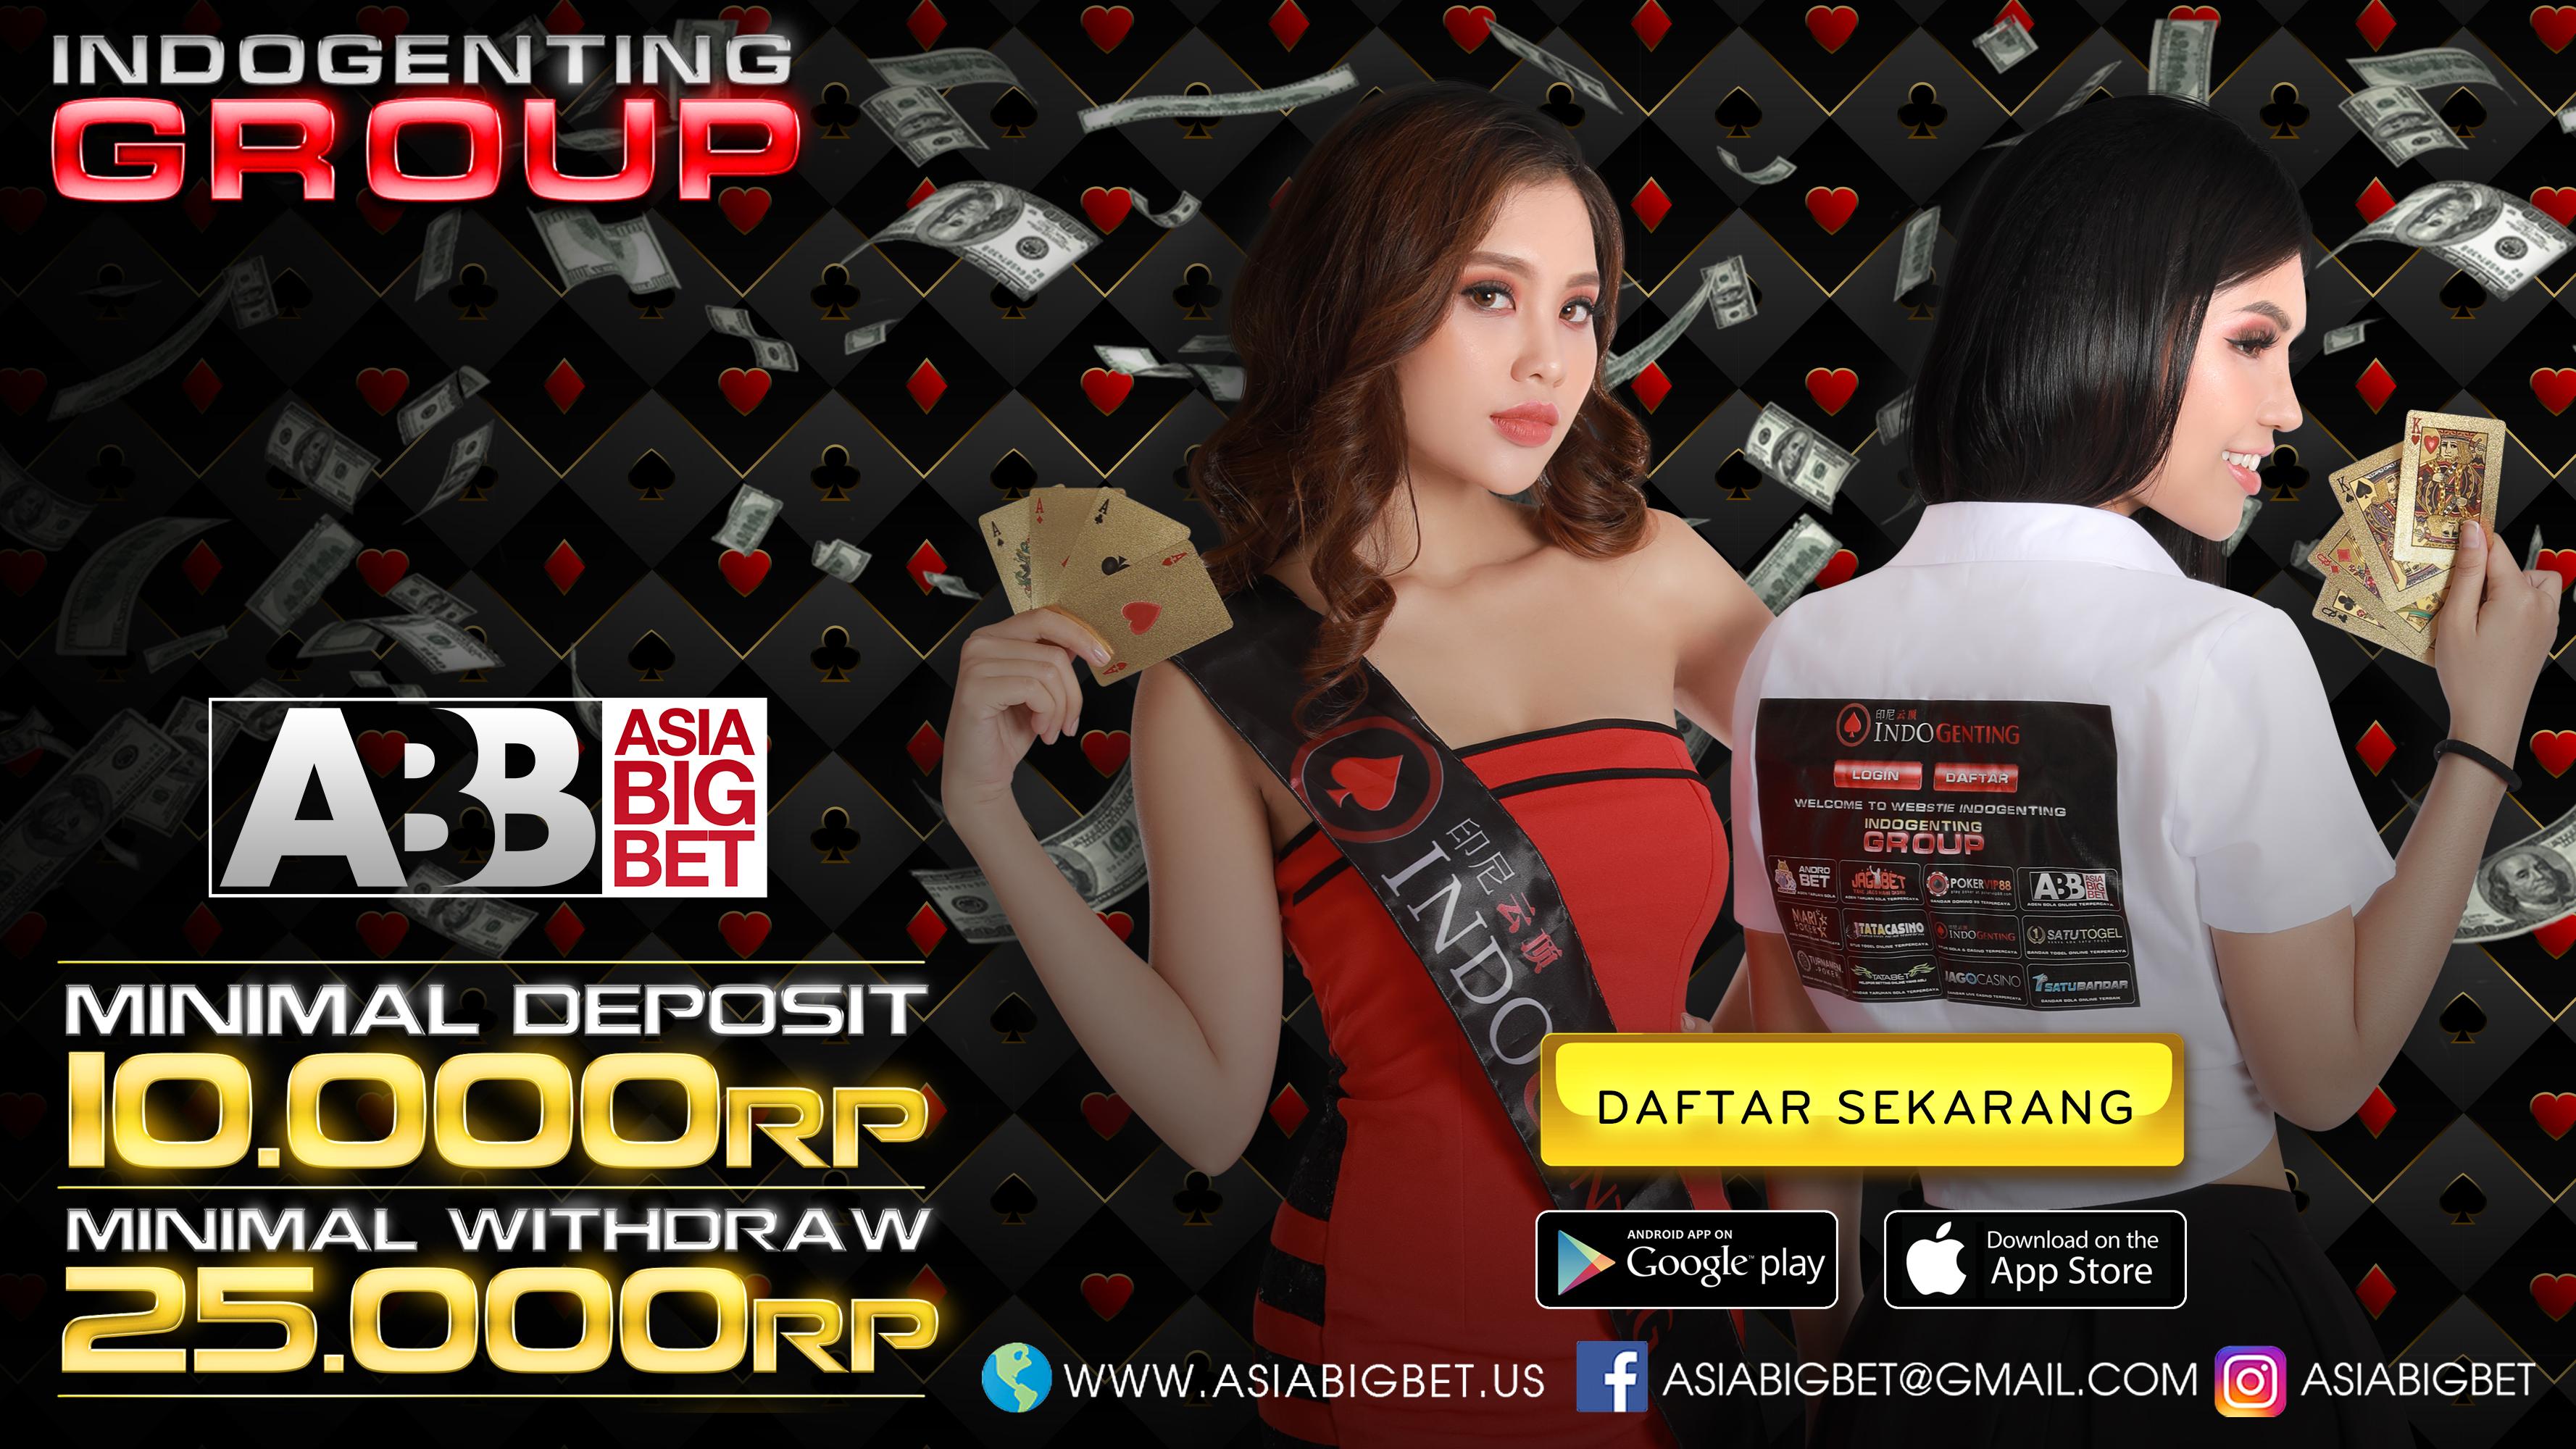 Kartu Domino, Asiabigbet, Poker Online, SBOBET, UBOBET